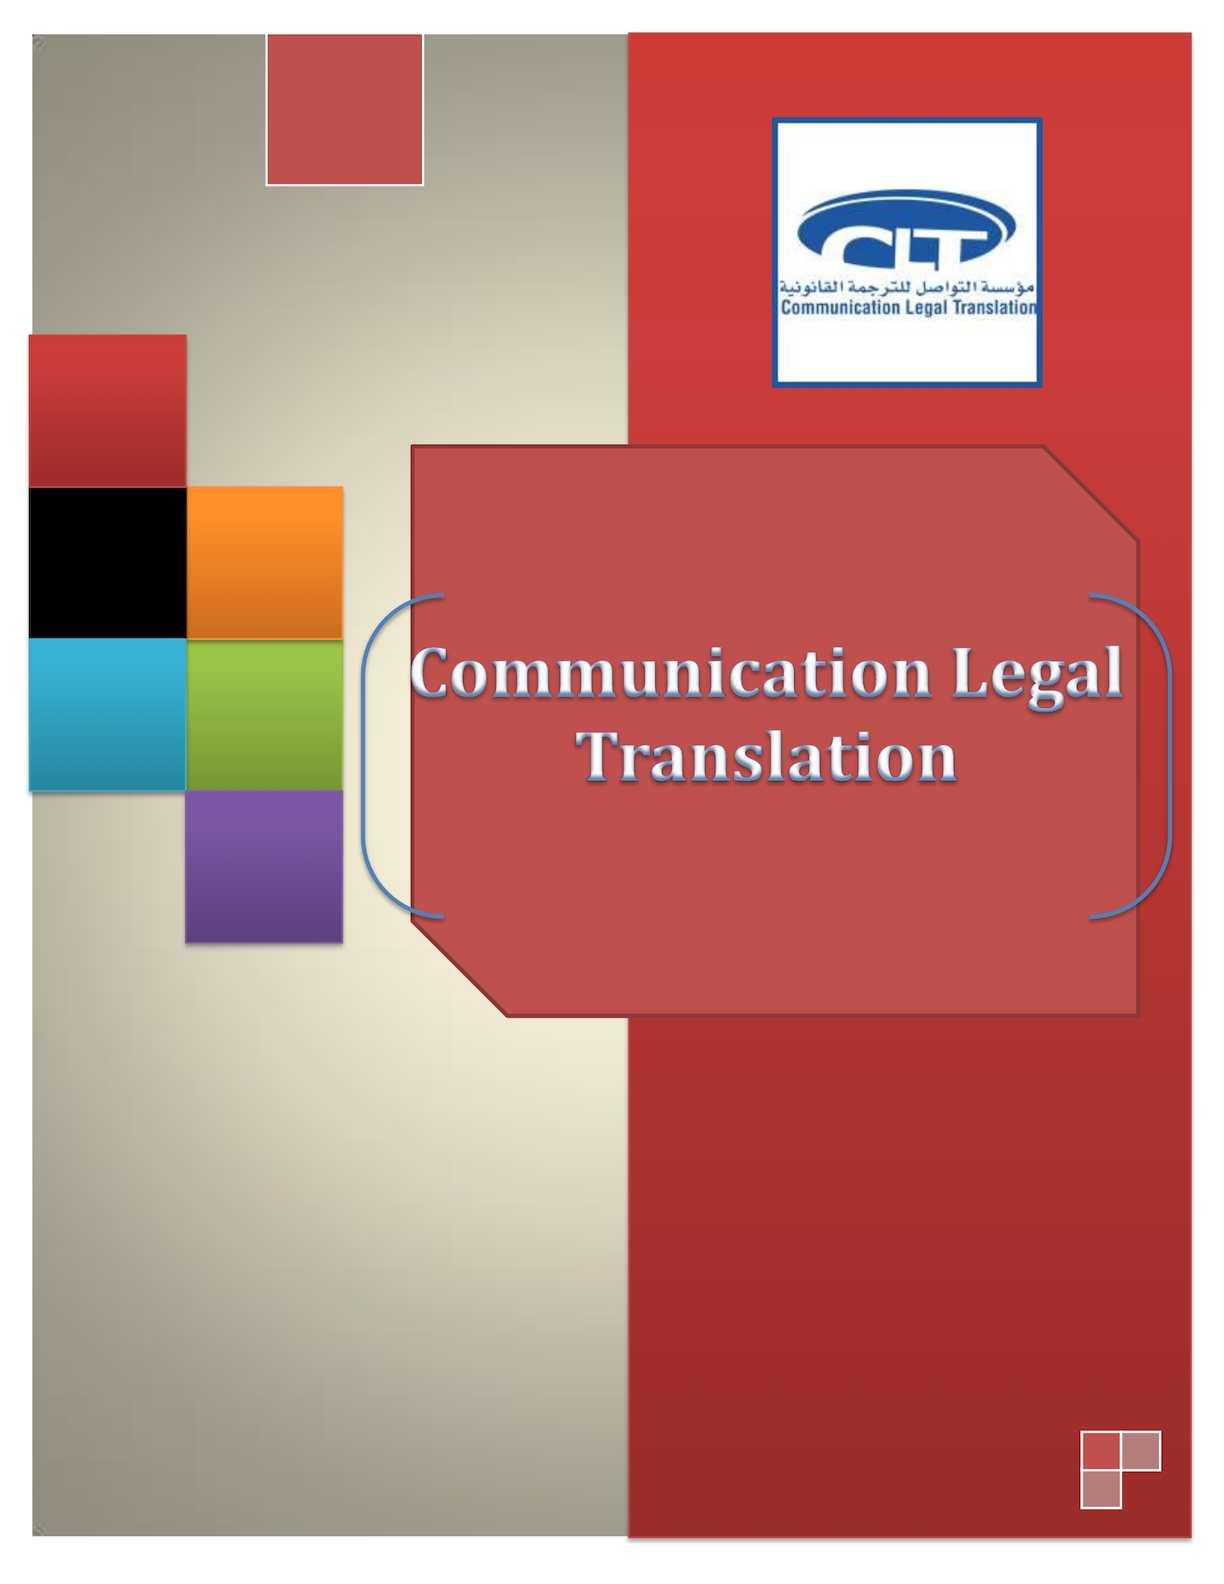 Communication Legalt Ranslation